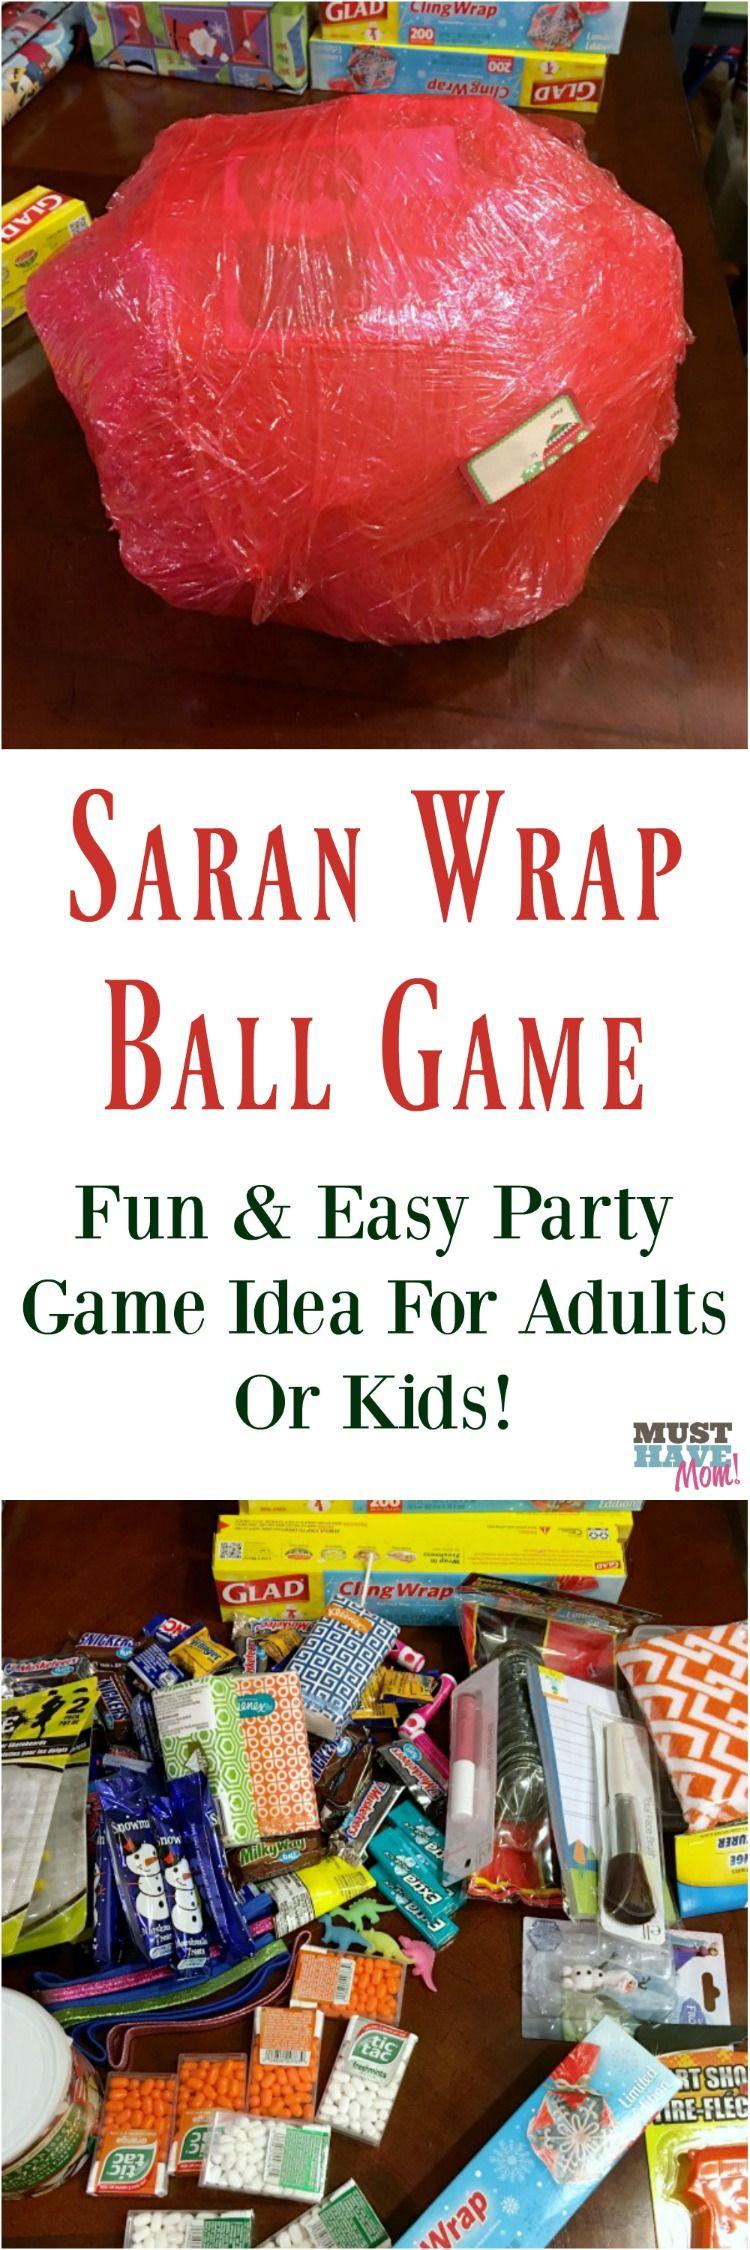 Saran Wrap Ball Game! Fun Party Game Idea For Kids Or